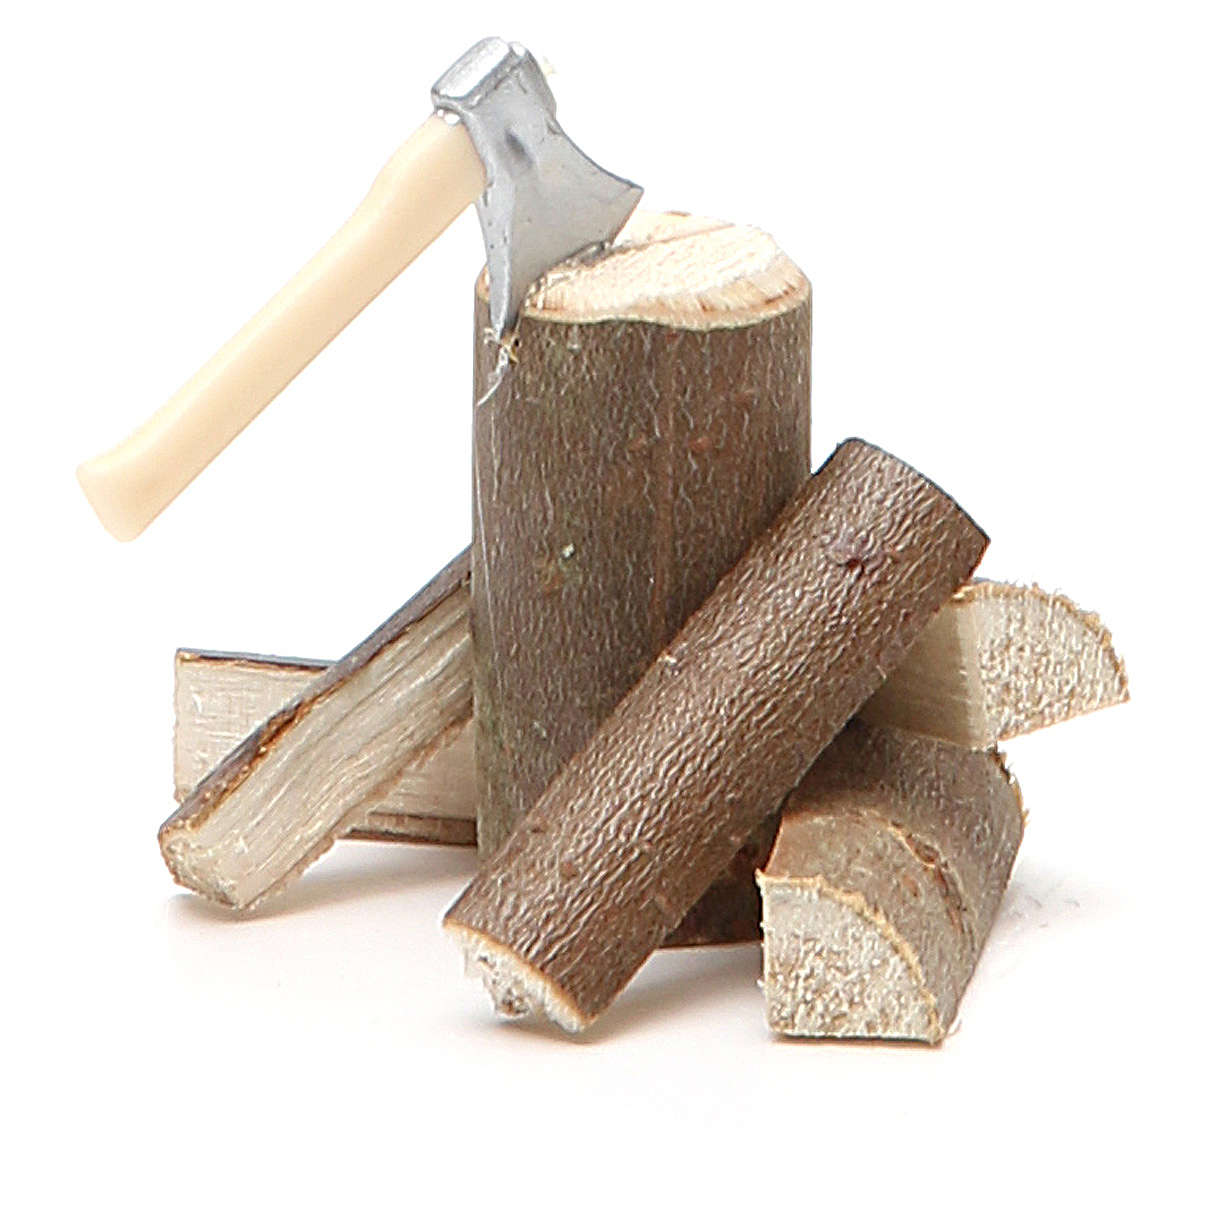 Axe with wood 5x5x8cm 4